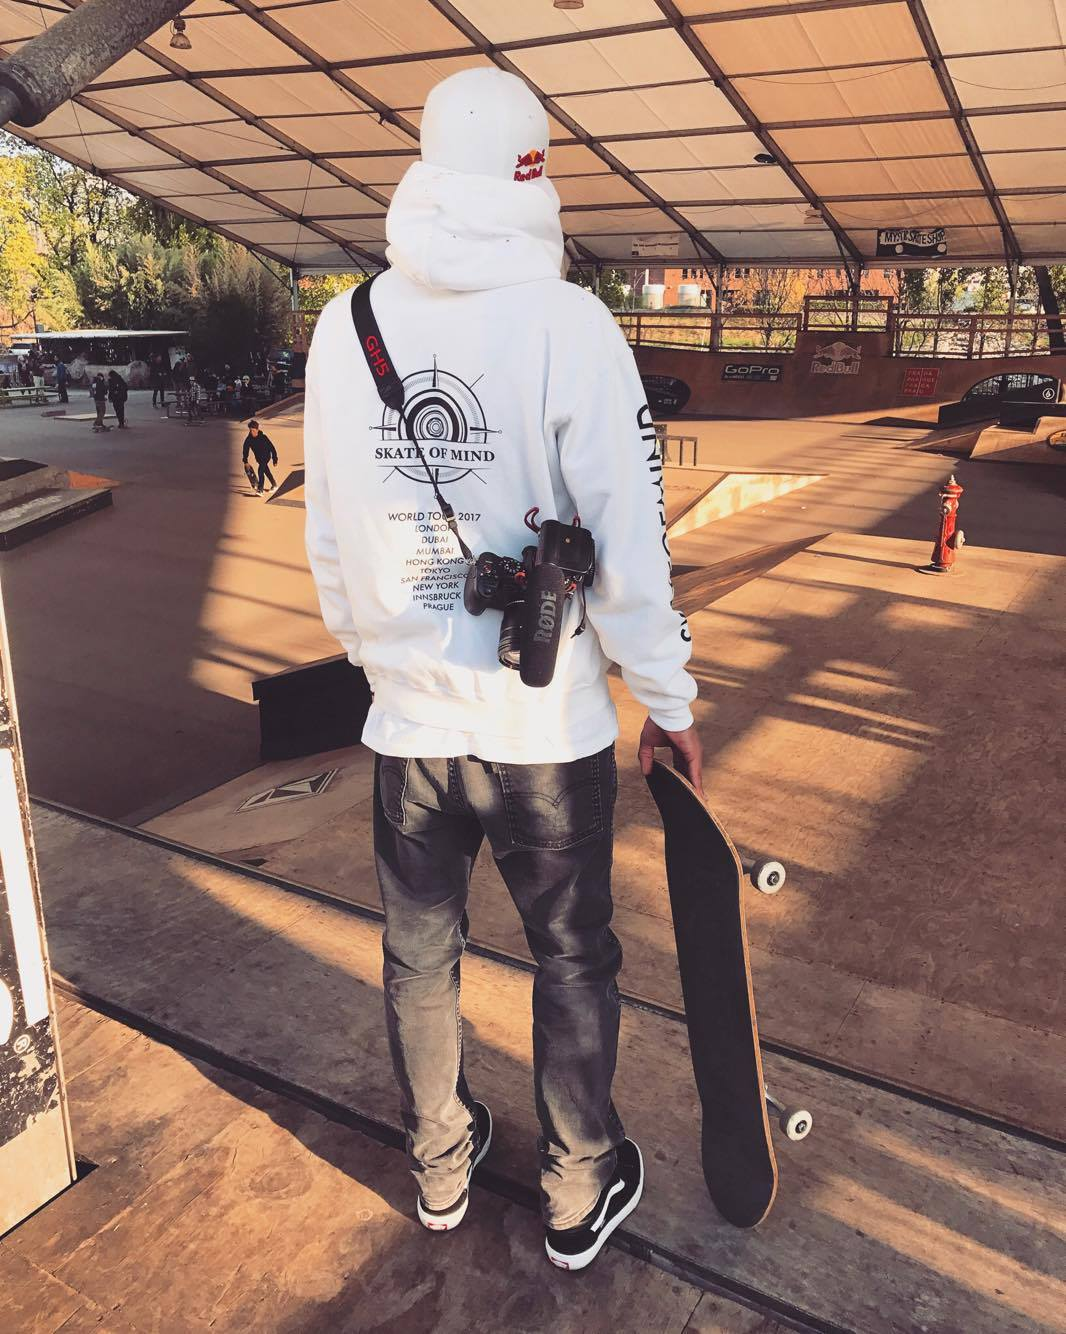 Panasonic LUMIX GH5 skateboarding